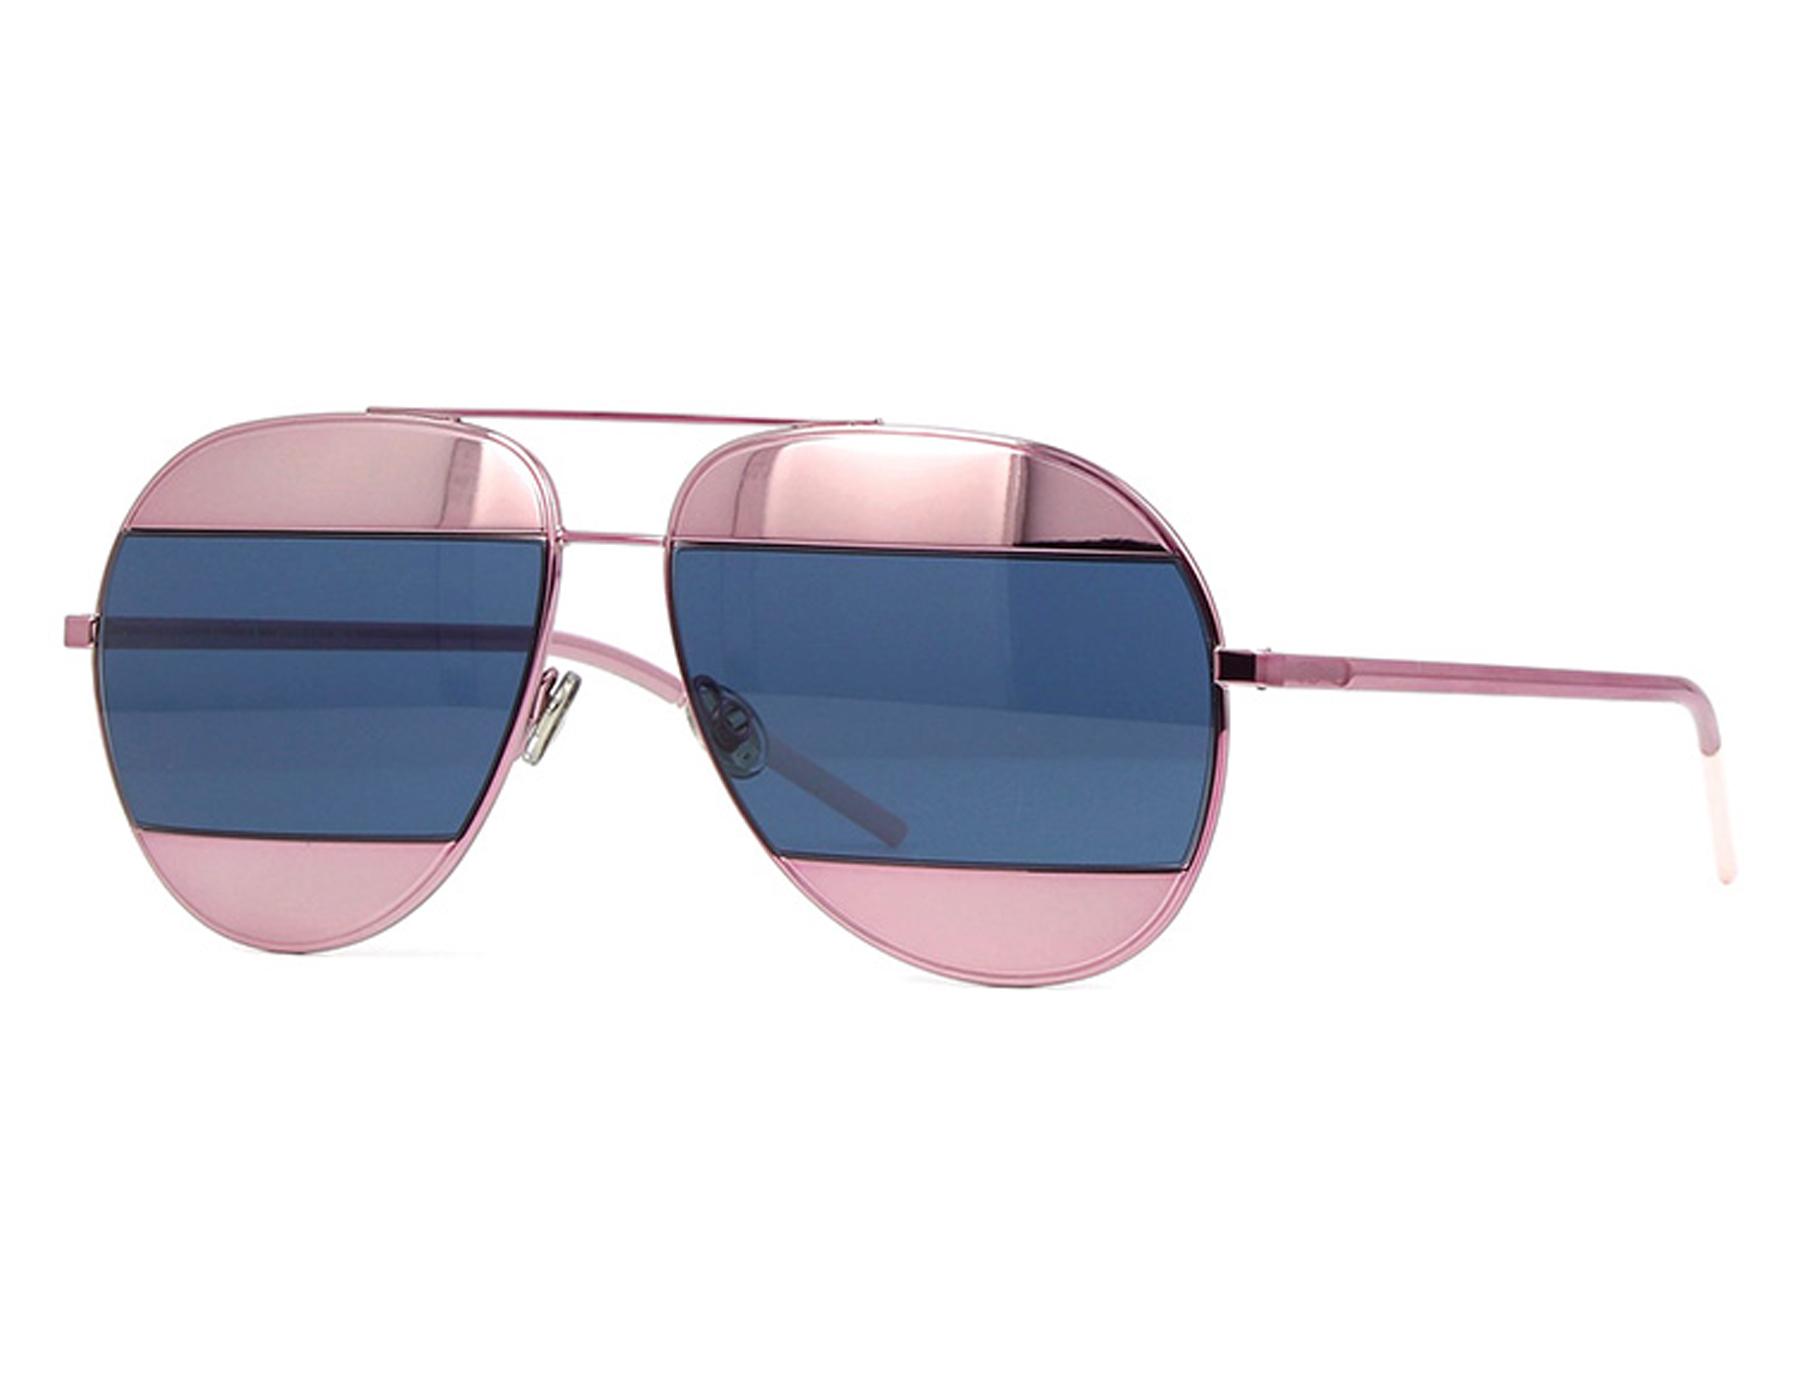 132b36bb707 Details about NEW Christian Dior SPLIT 1 02T8F Pink Mirror Blue Sunglasses